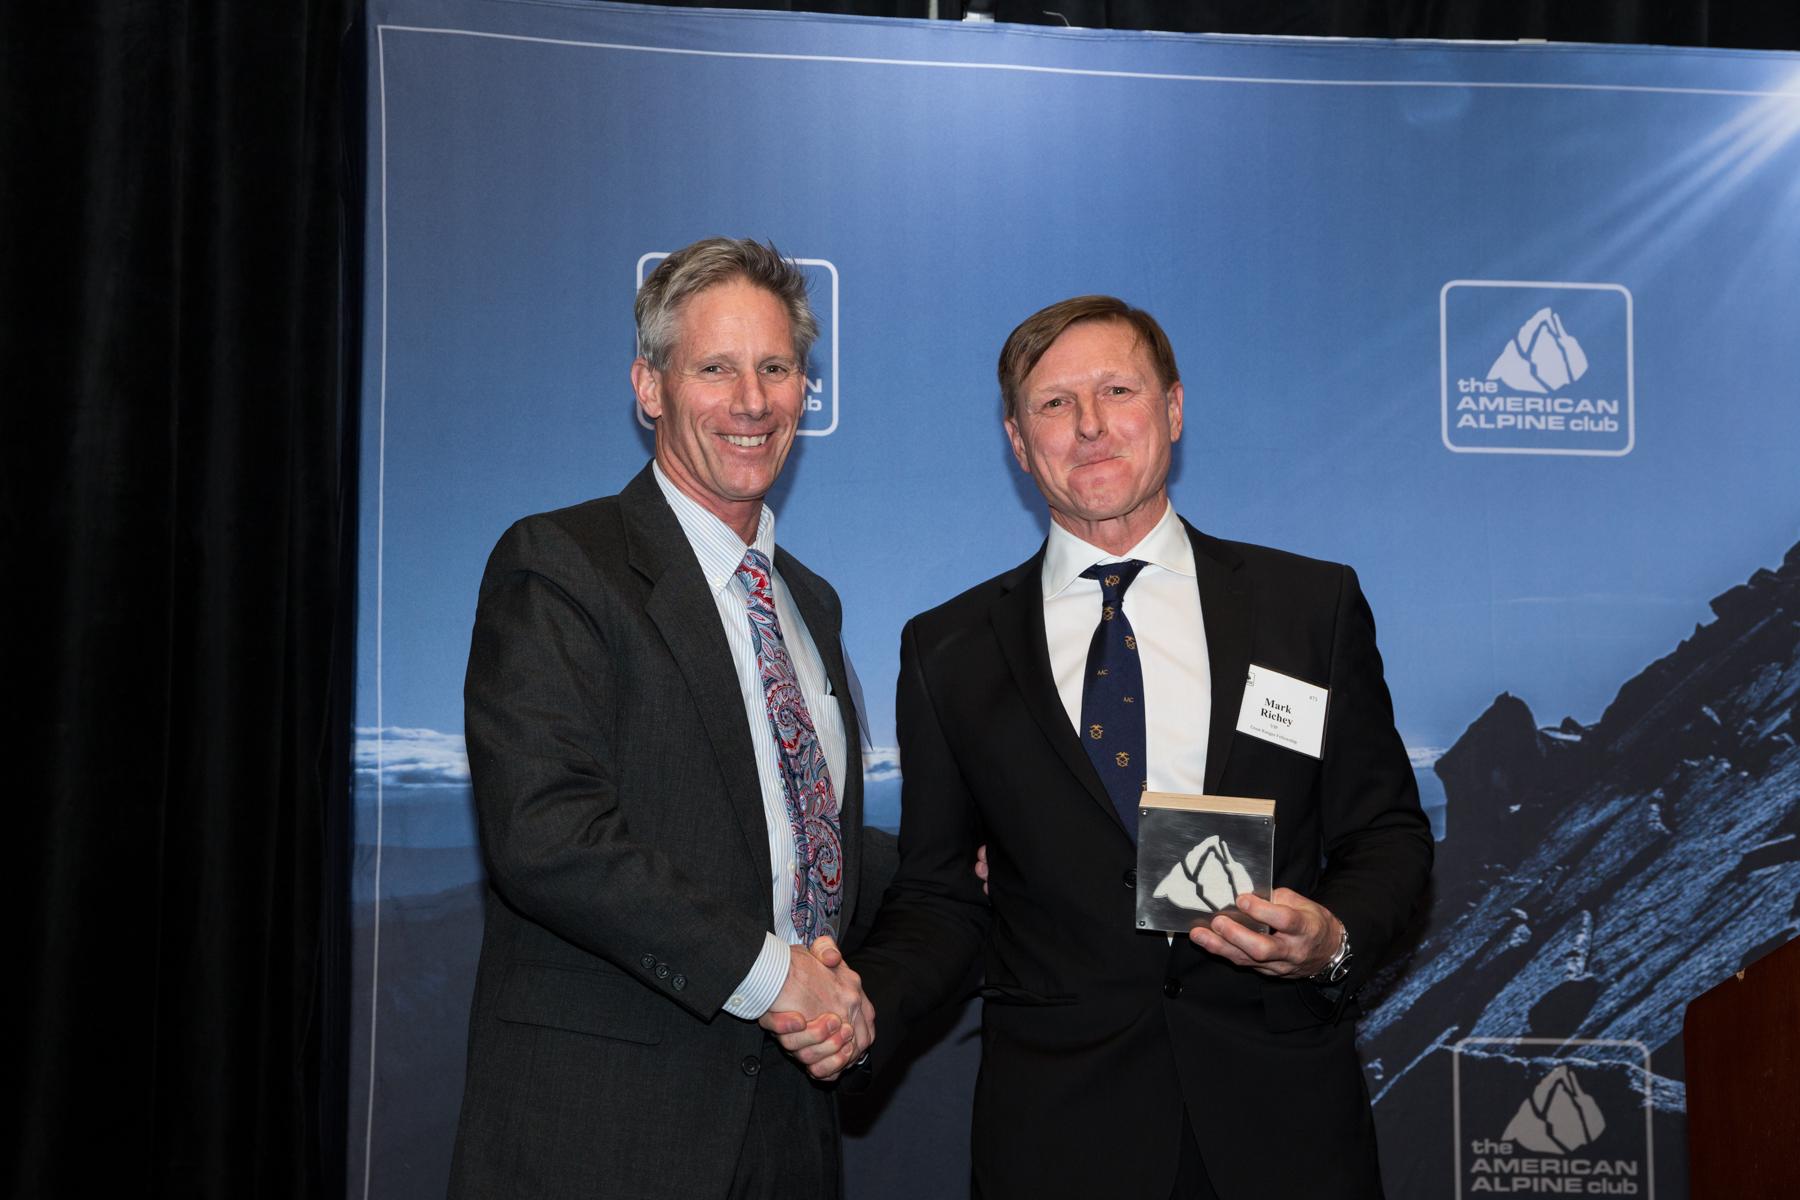 AAC President Matt Culberson presenting Mark Richey's Award. Photo: Tegra Nuess